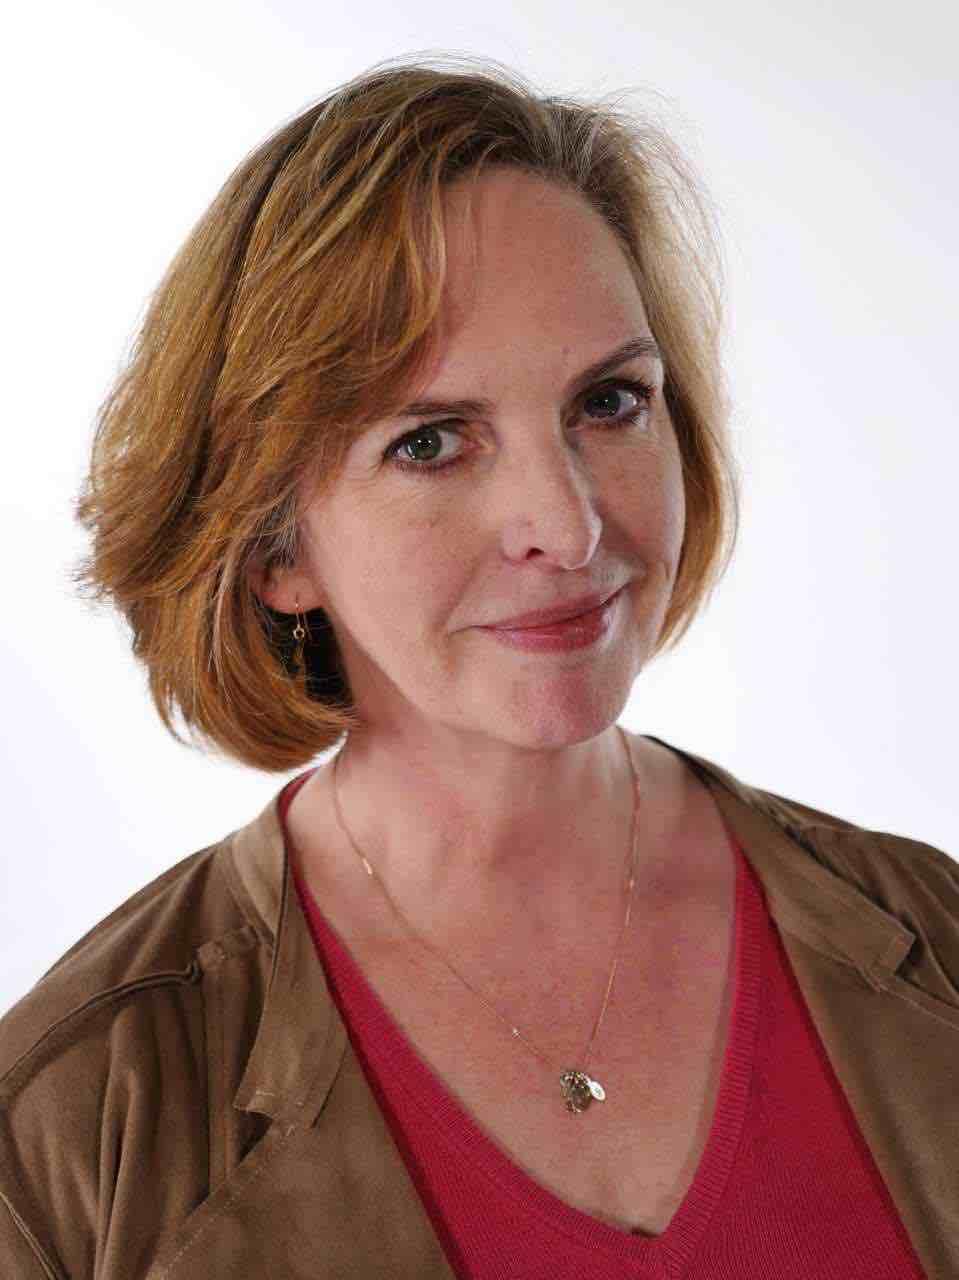 Vanessa Crump